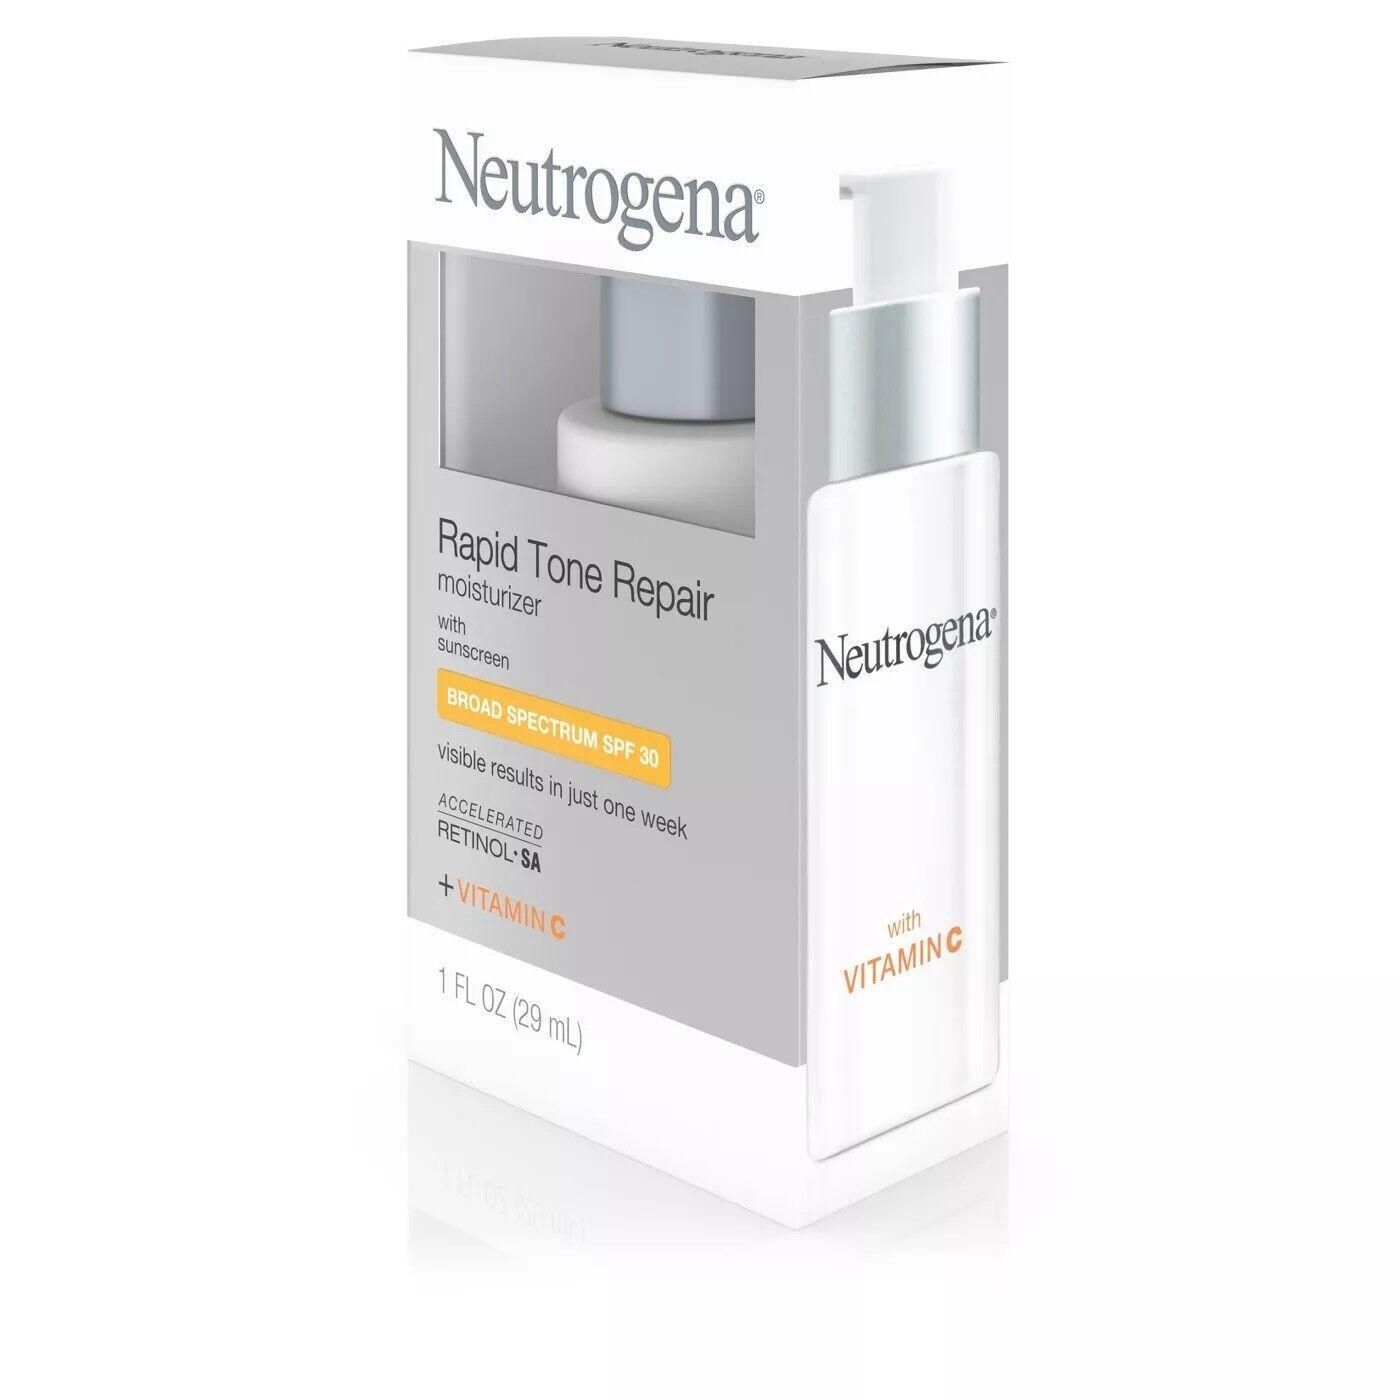 Neutrogena Rapid Tone Repair Daily Facial Moisturizer with R